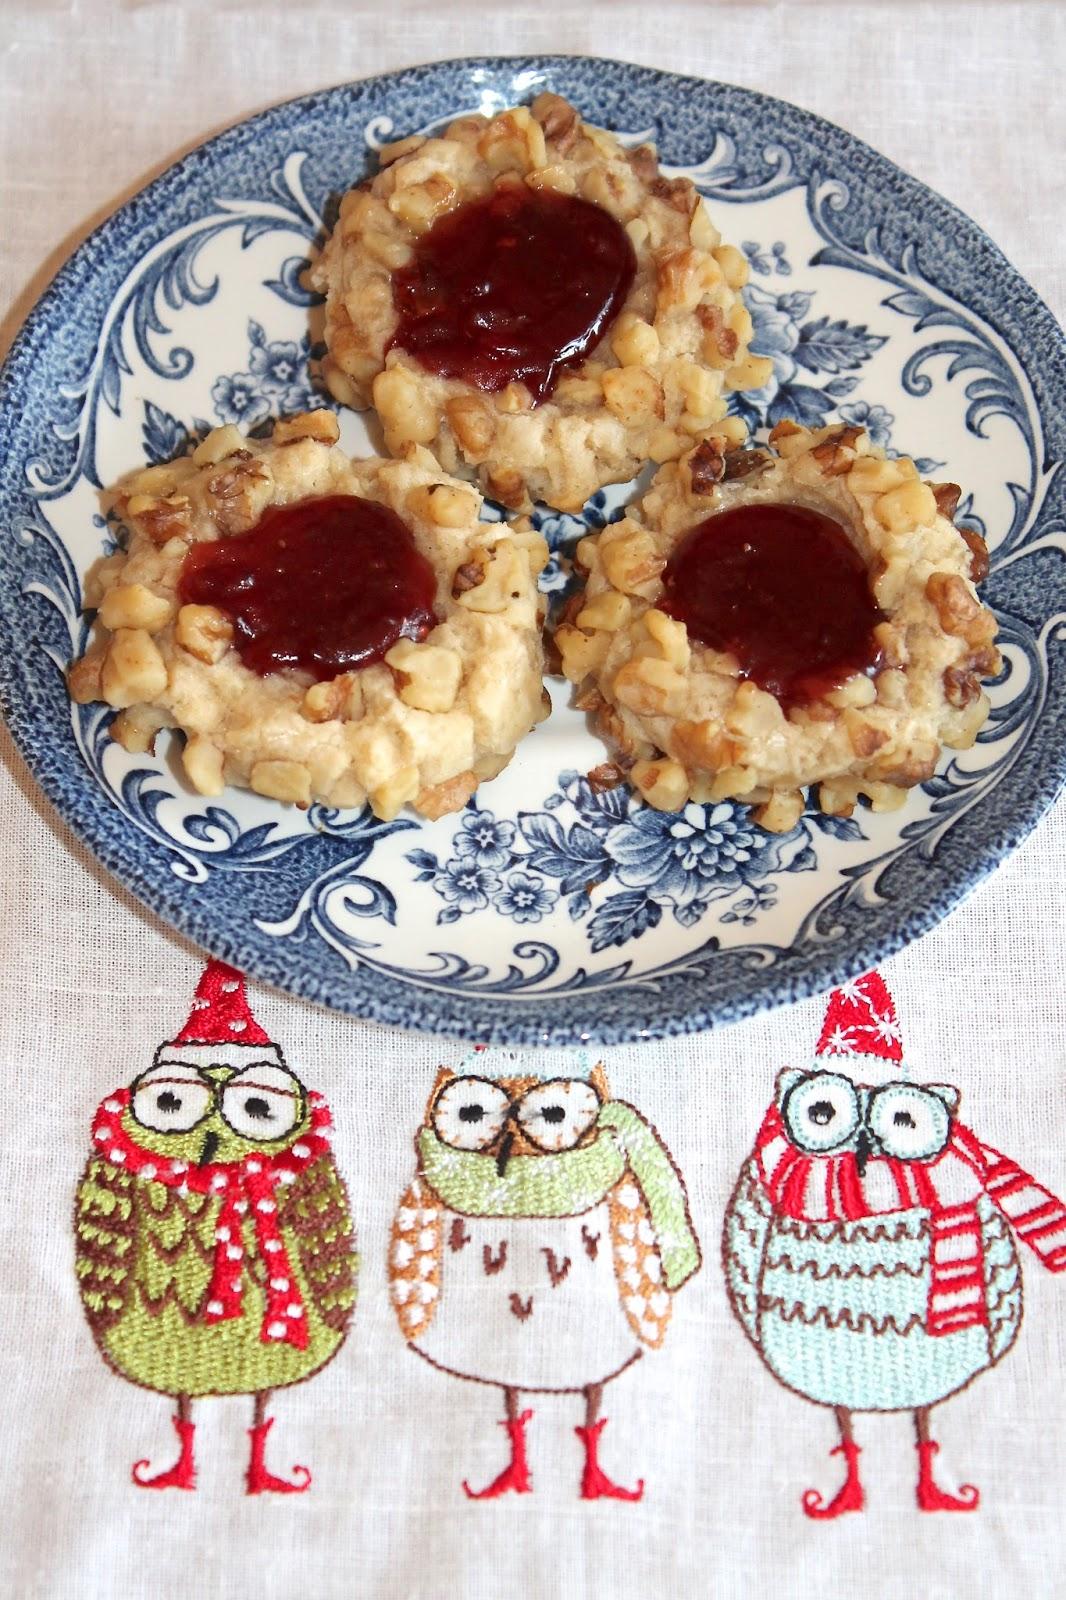 Gram's Classic Thumbprint Cookies